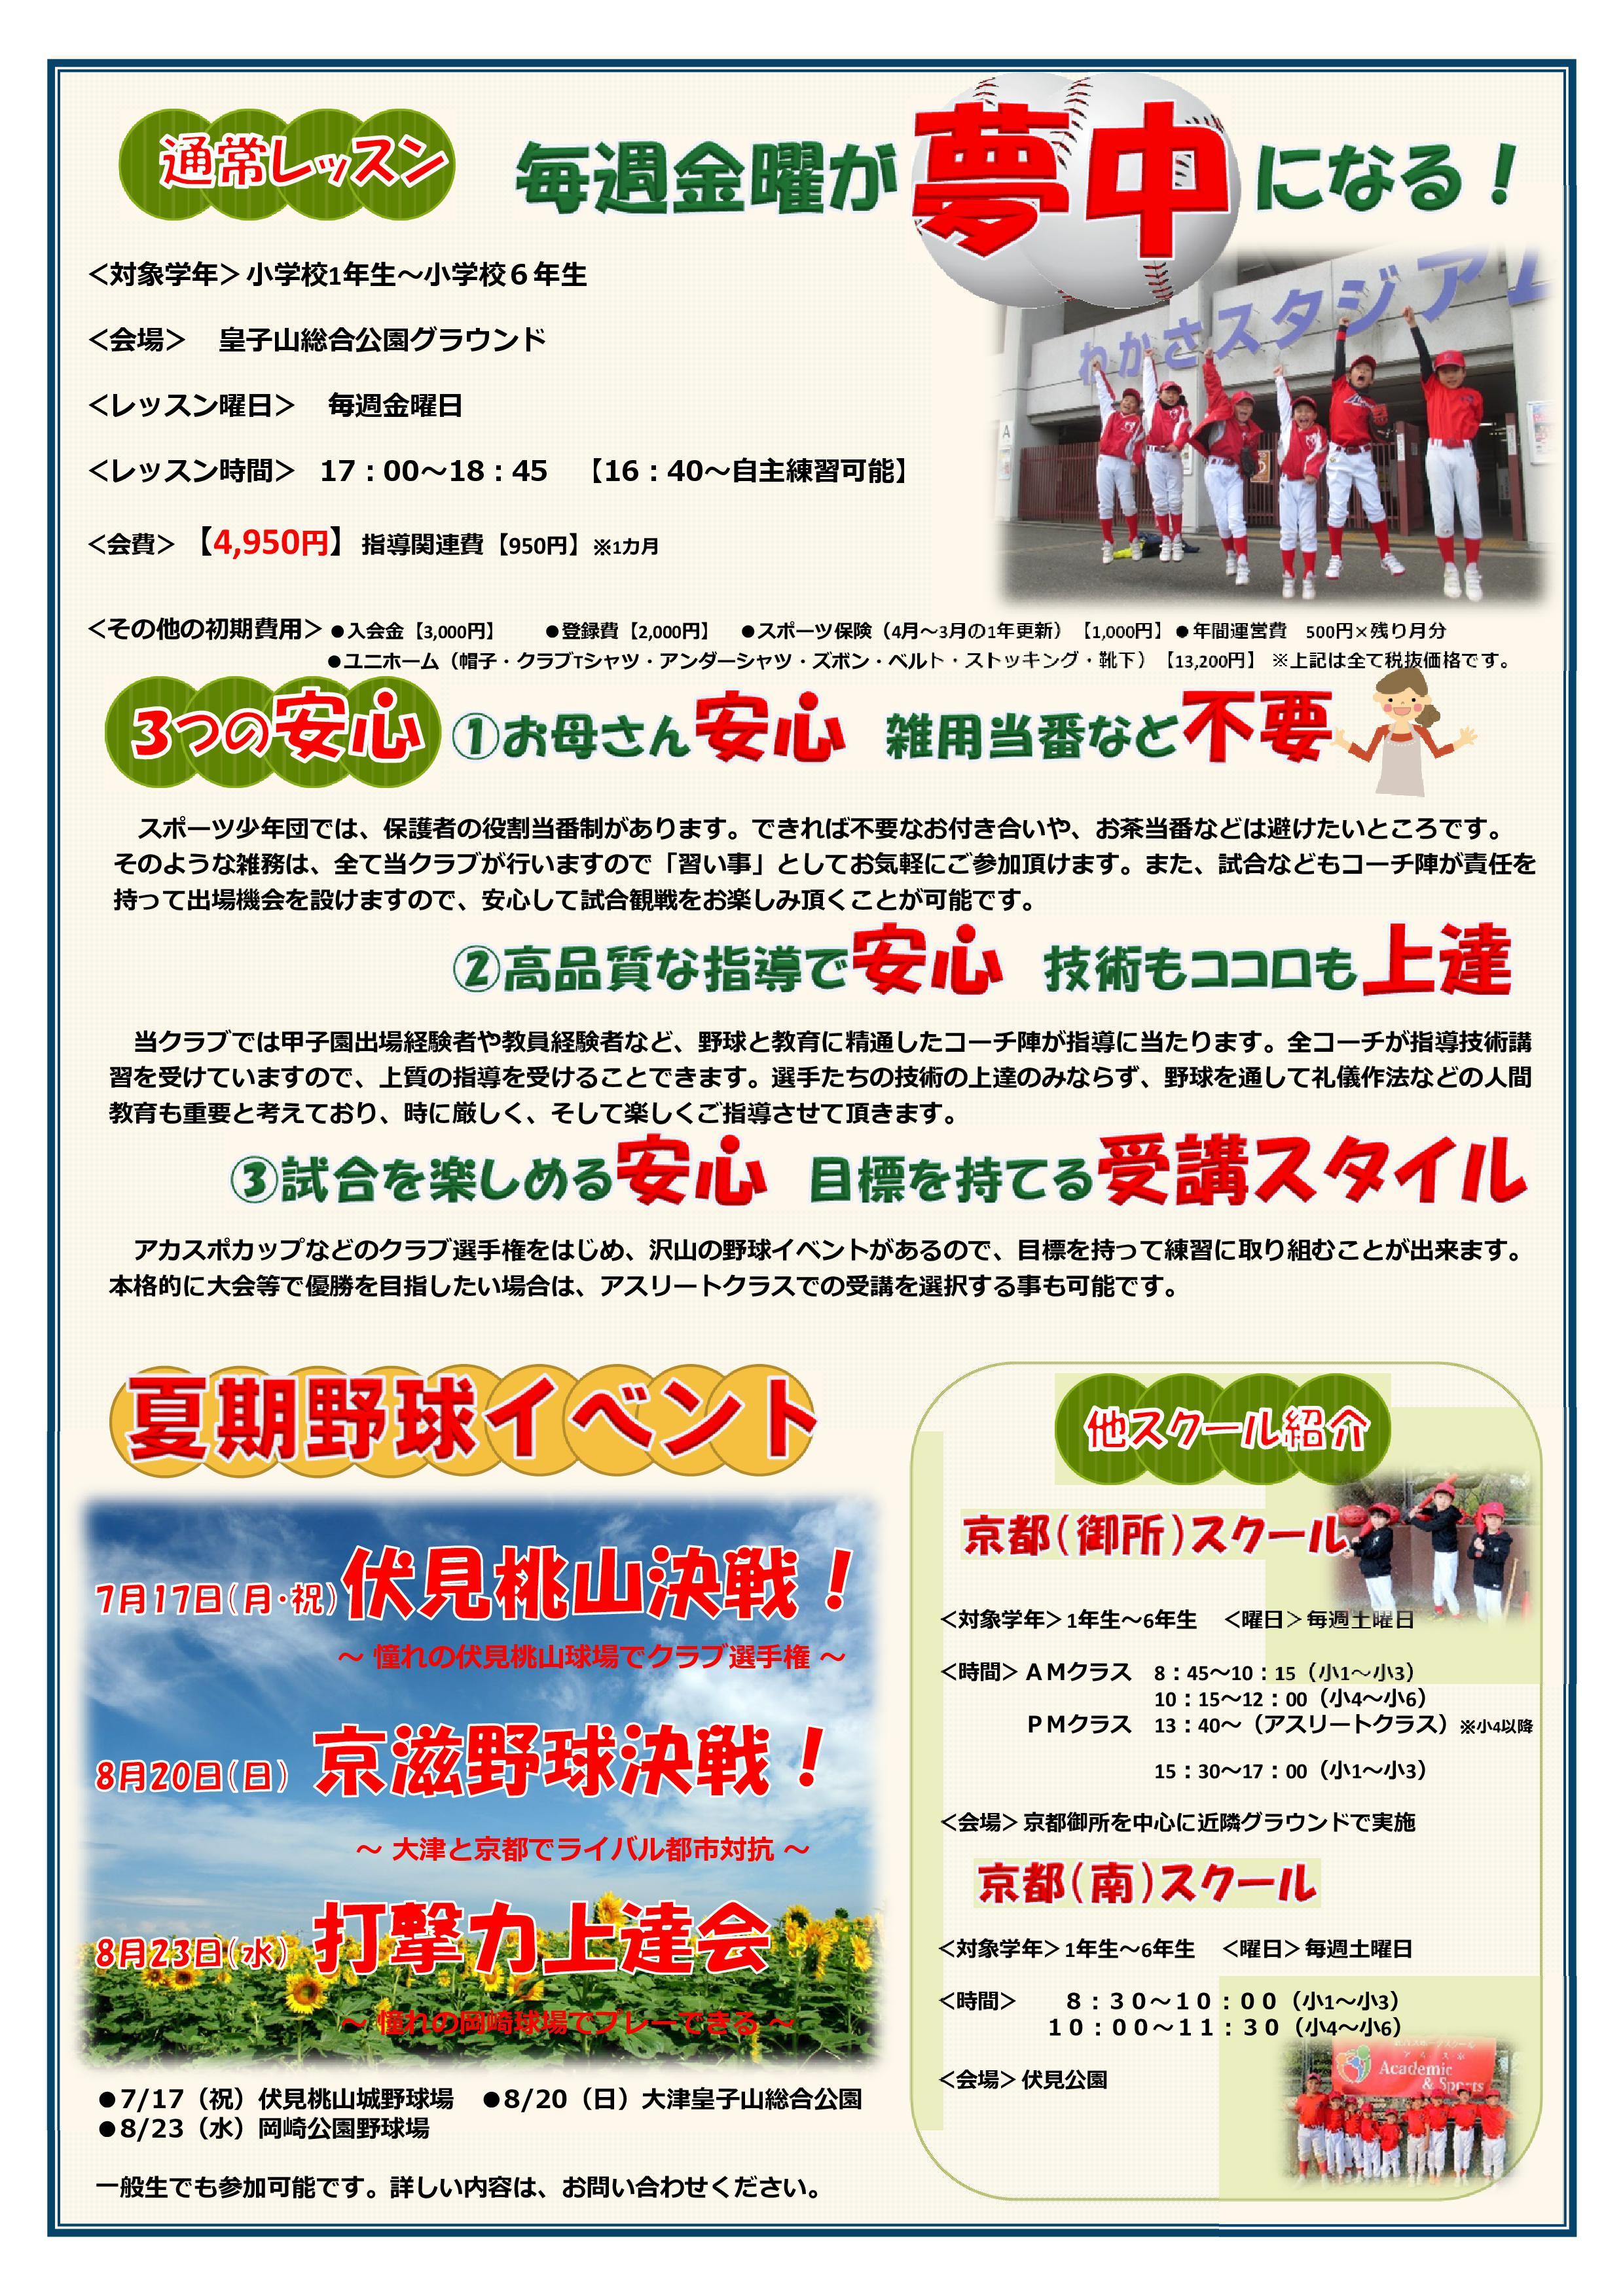 Microsoft PowerPoint - 大津(皇子山)BCチラシ-002